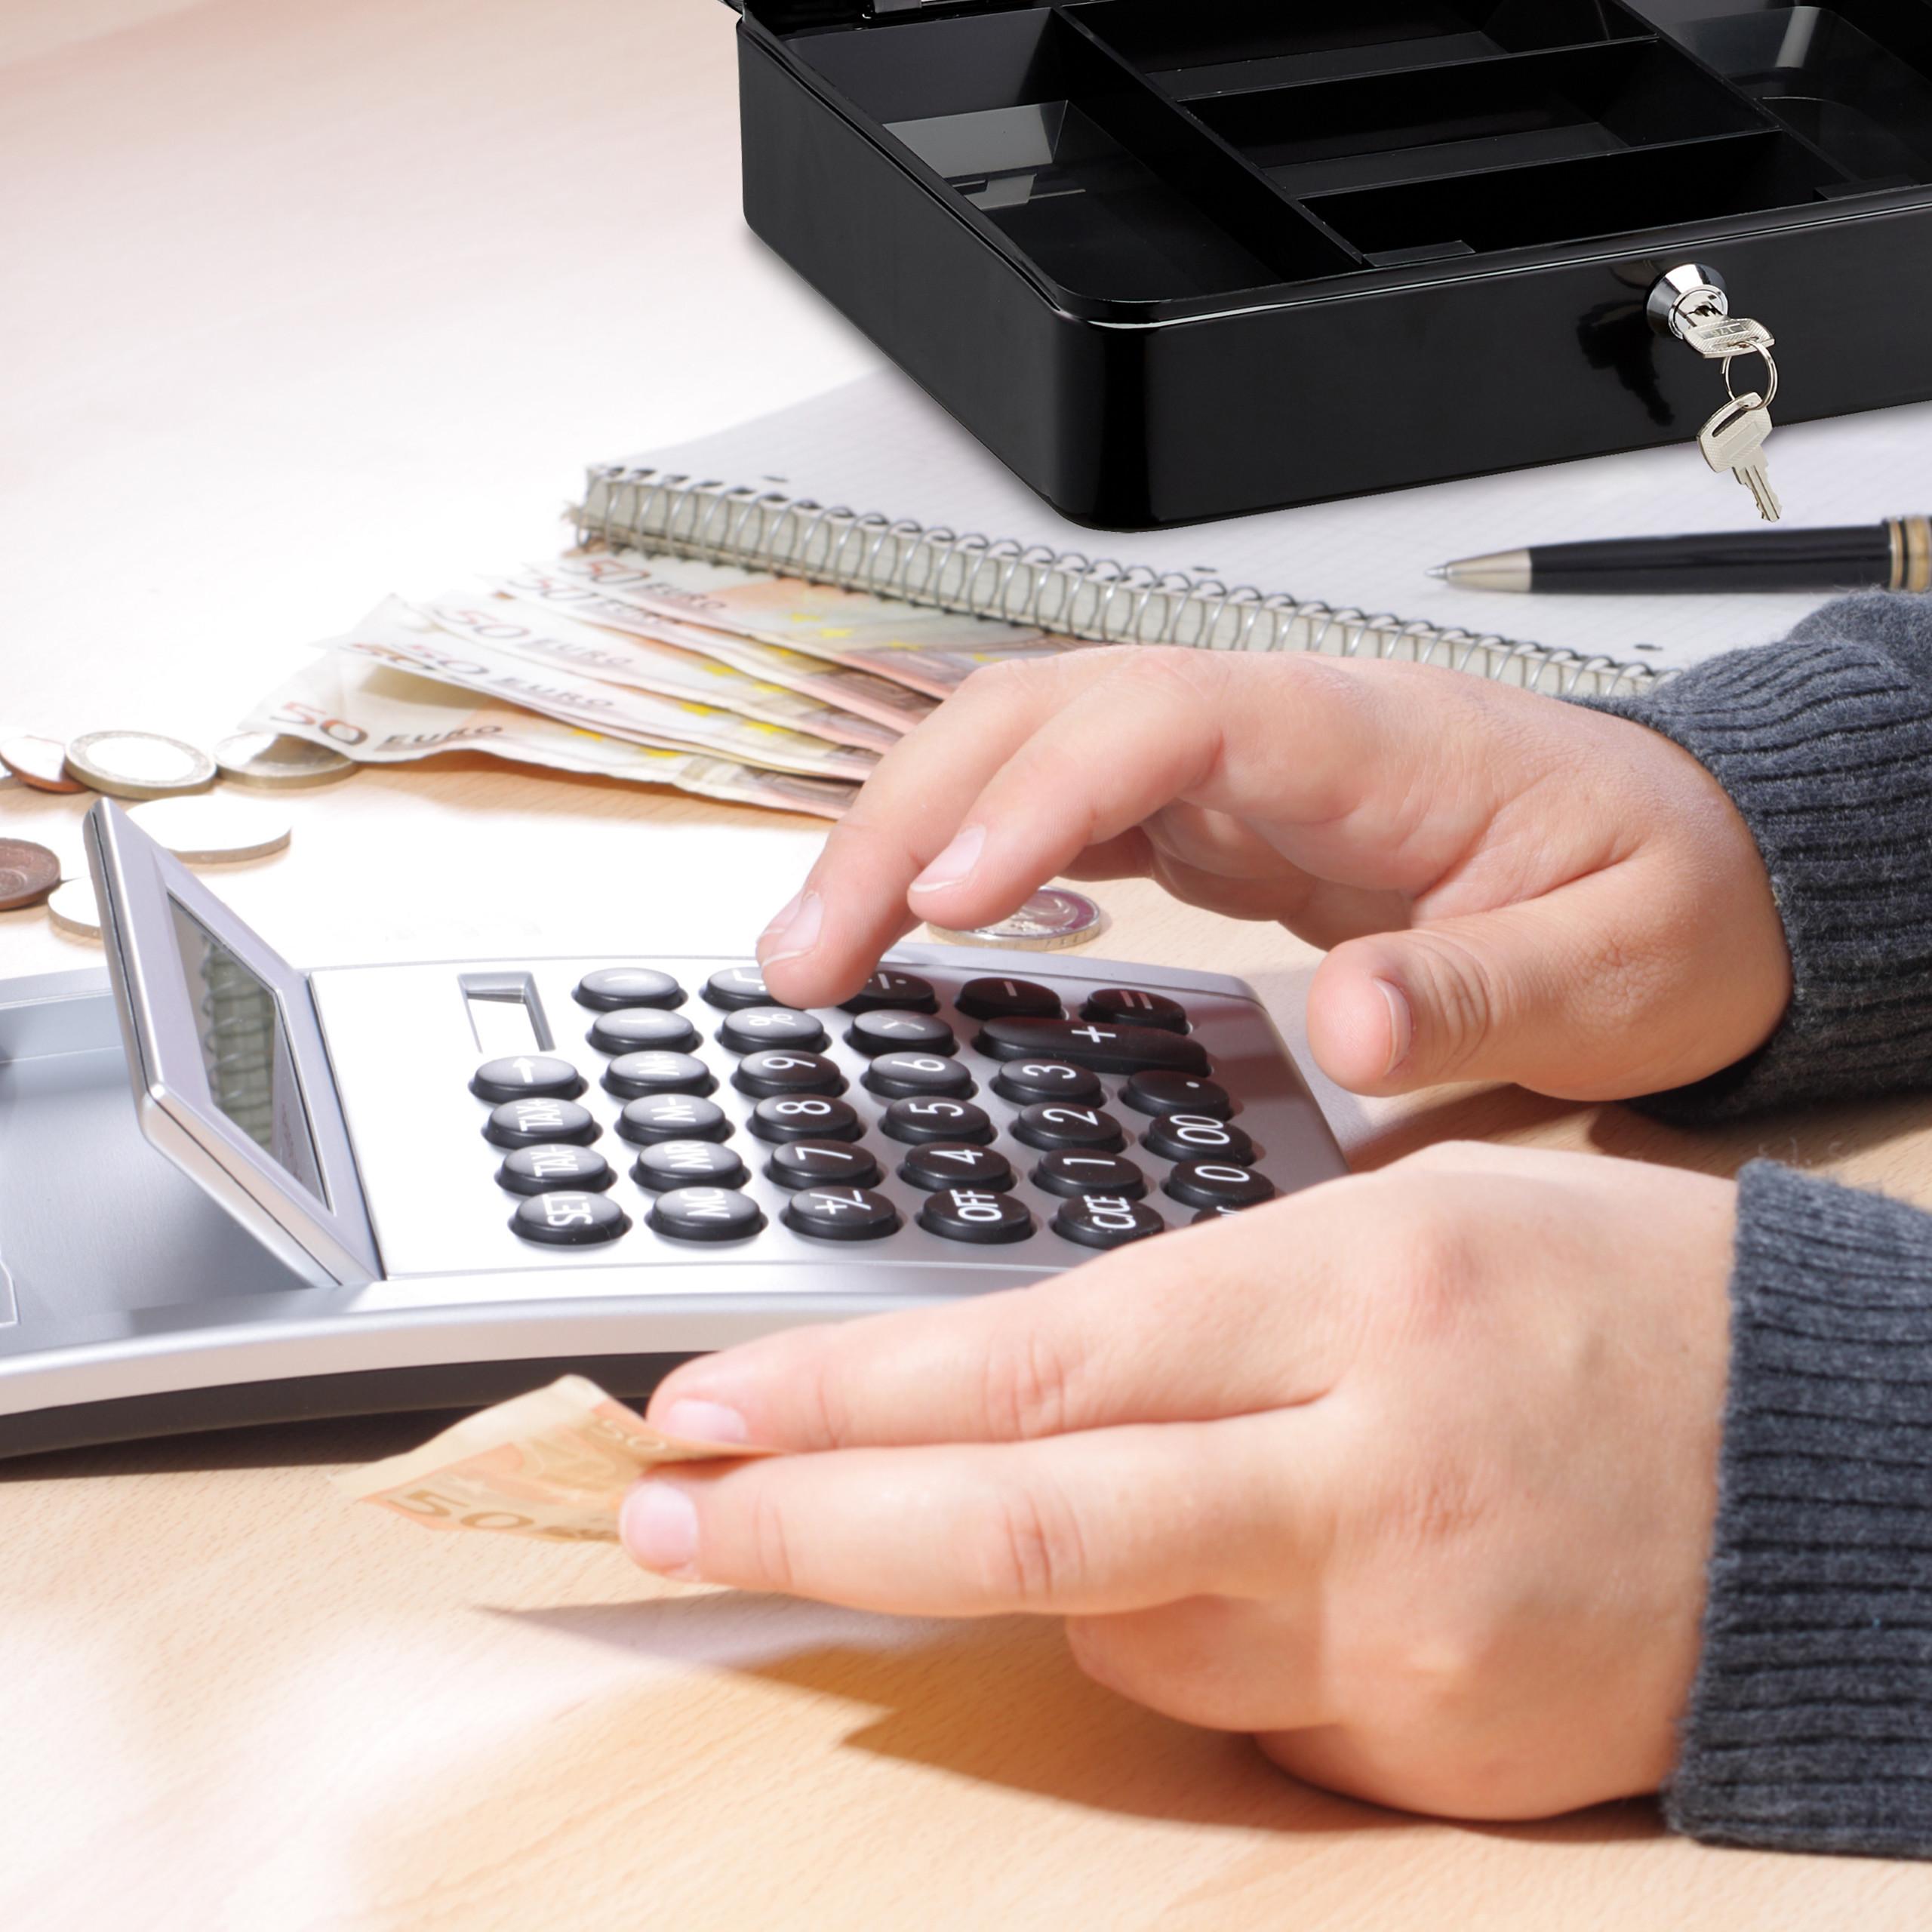 Lockable-Cash-Box-Large-Locking-Money-Box-with-2-Keys-Metal-Case-Safe thumbnail 6